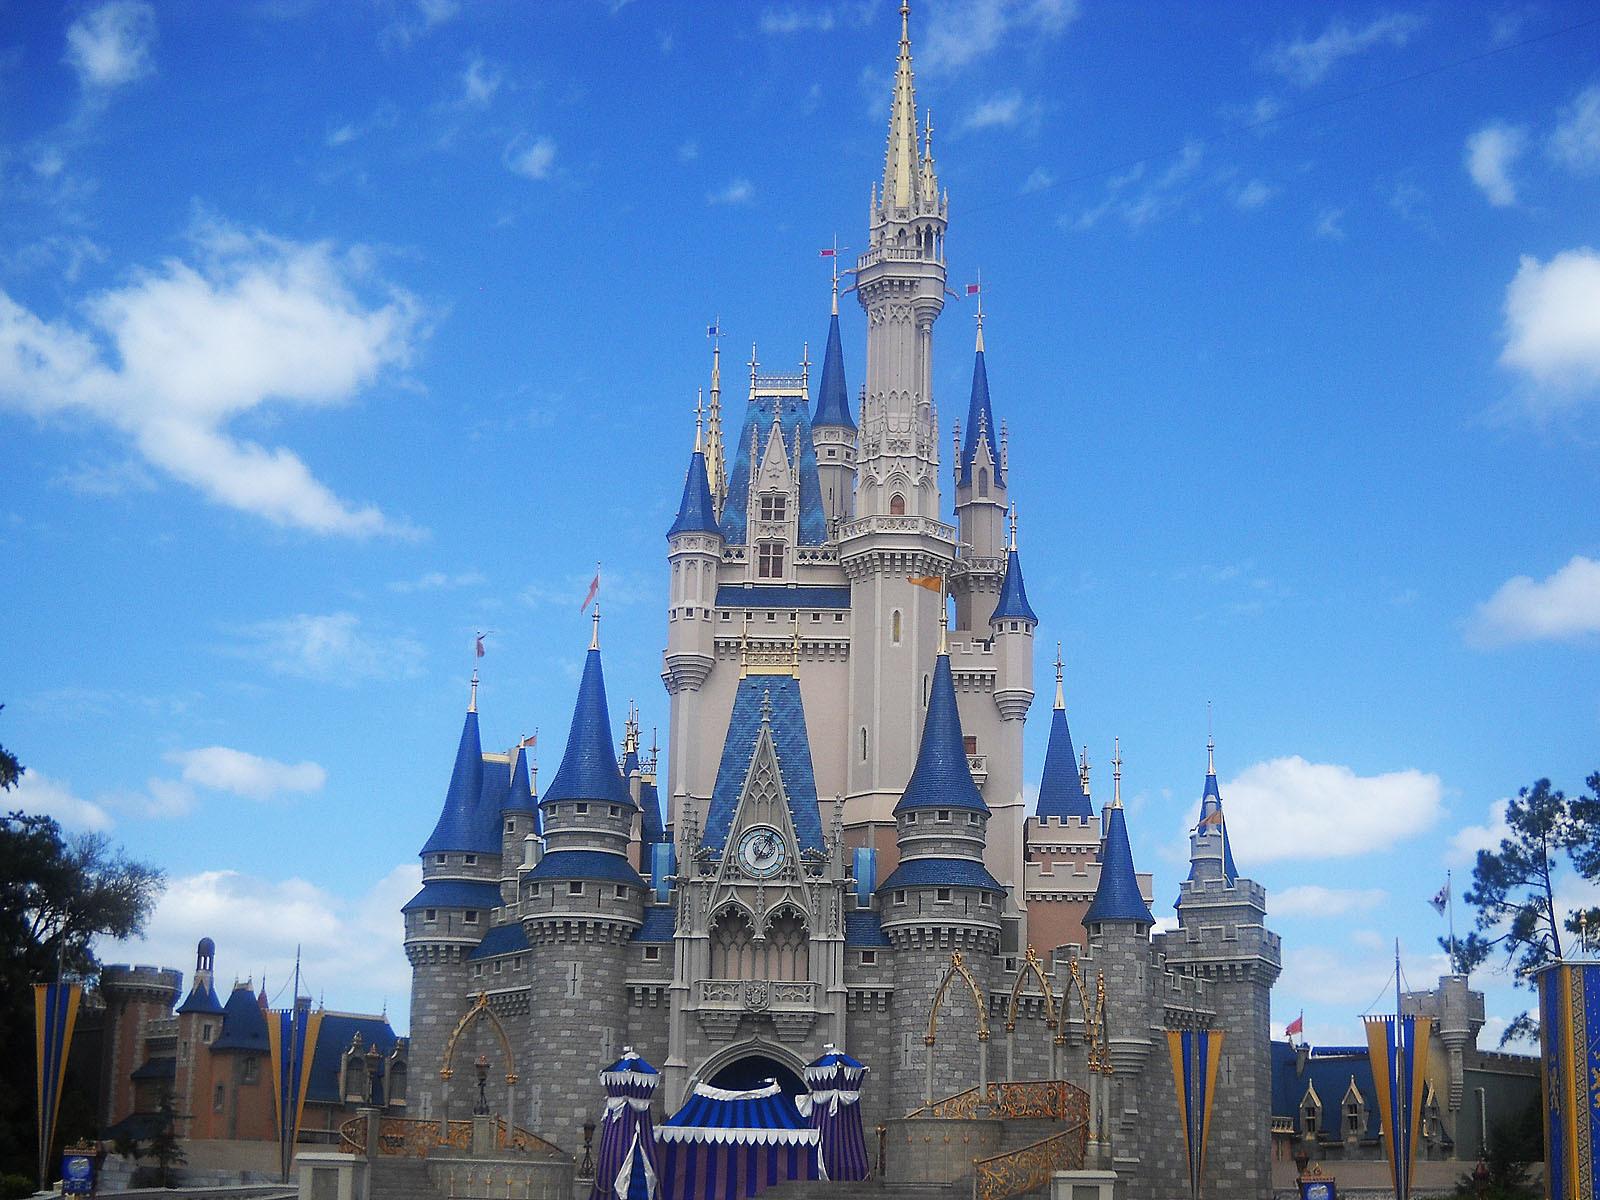 фото сказочного дворца